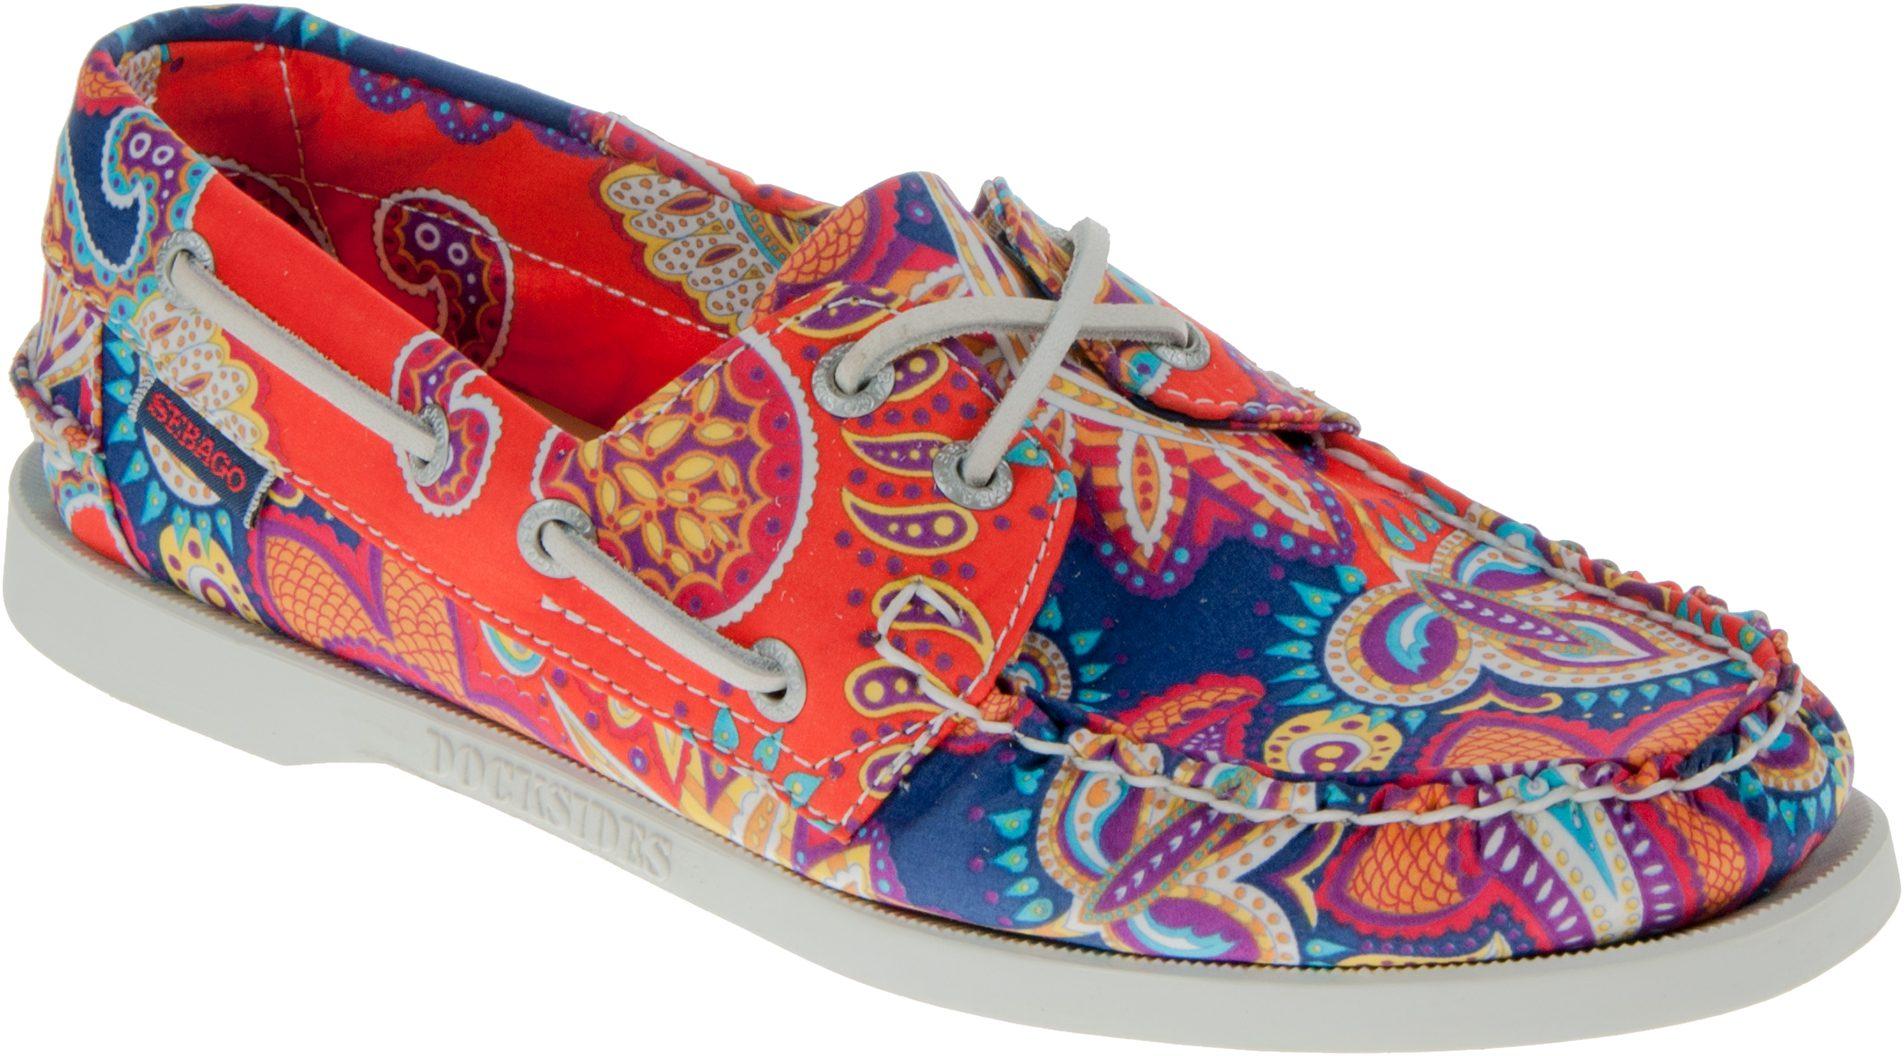 437eedb472a62 Sebago Docksides Womens Persia Liberty Print B500160 - Everyday Shoes -  Humphries Shoes